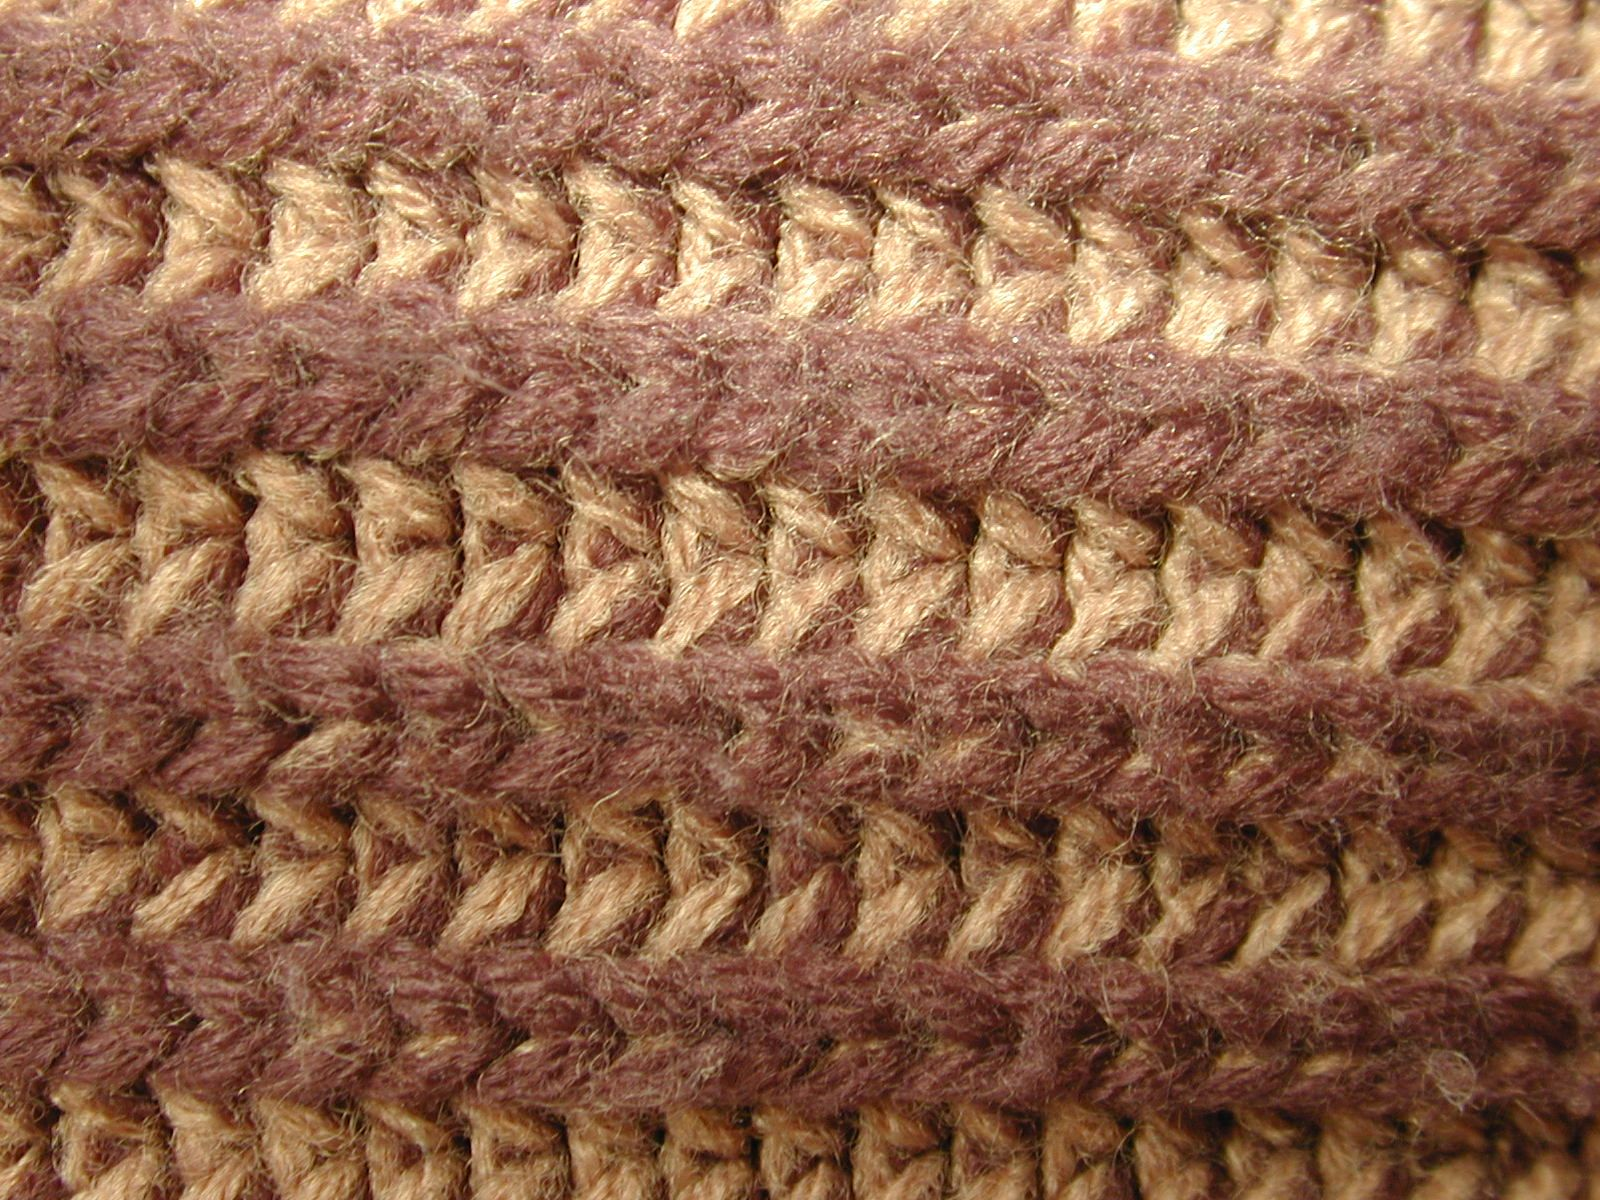 knit knitting weave wove fabric wool texture cloth clothing pattern crochet